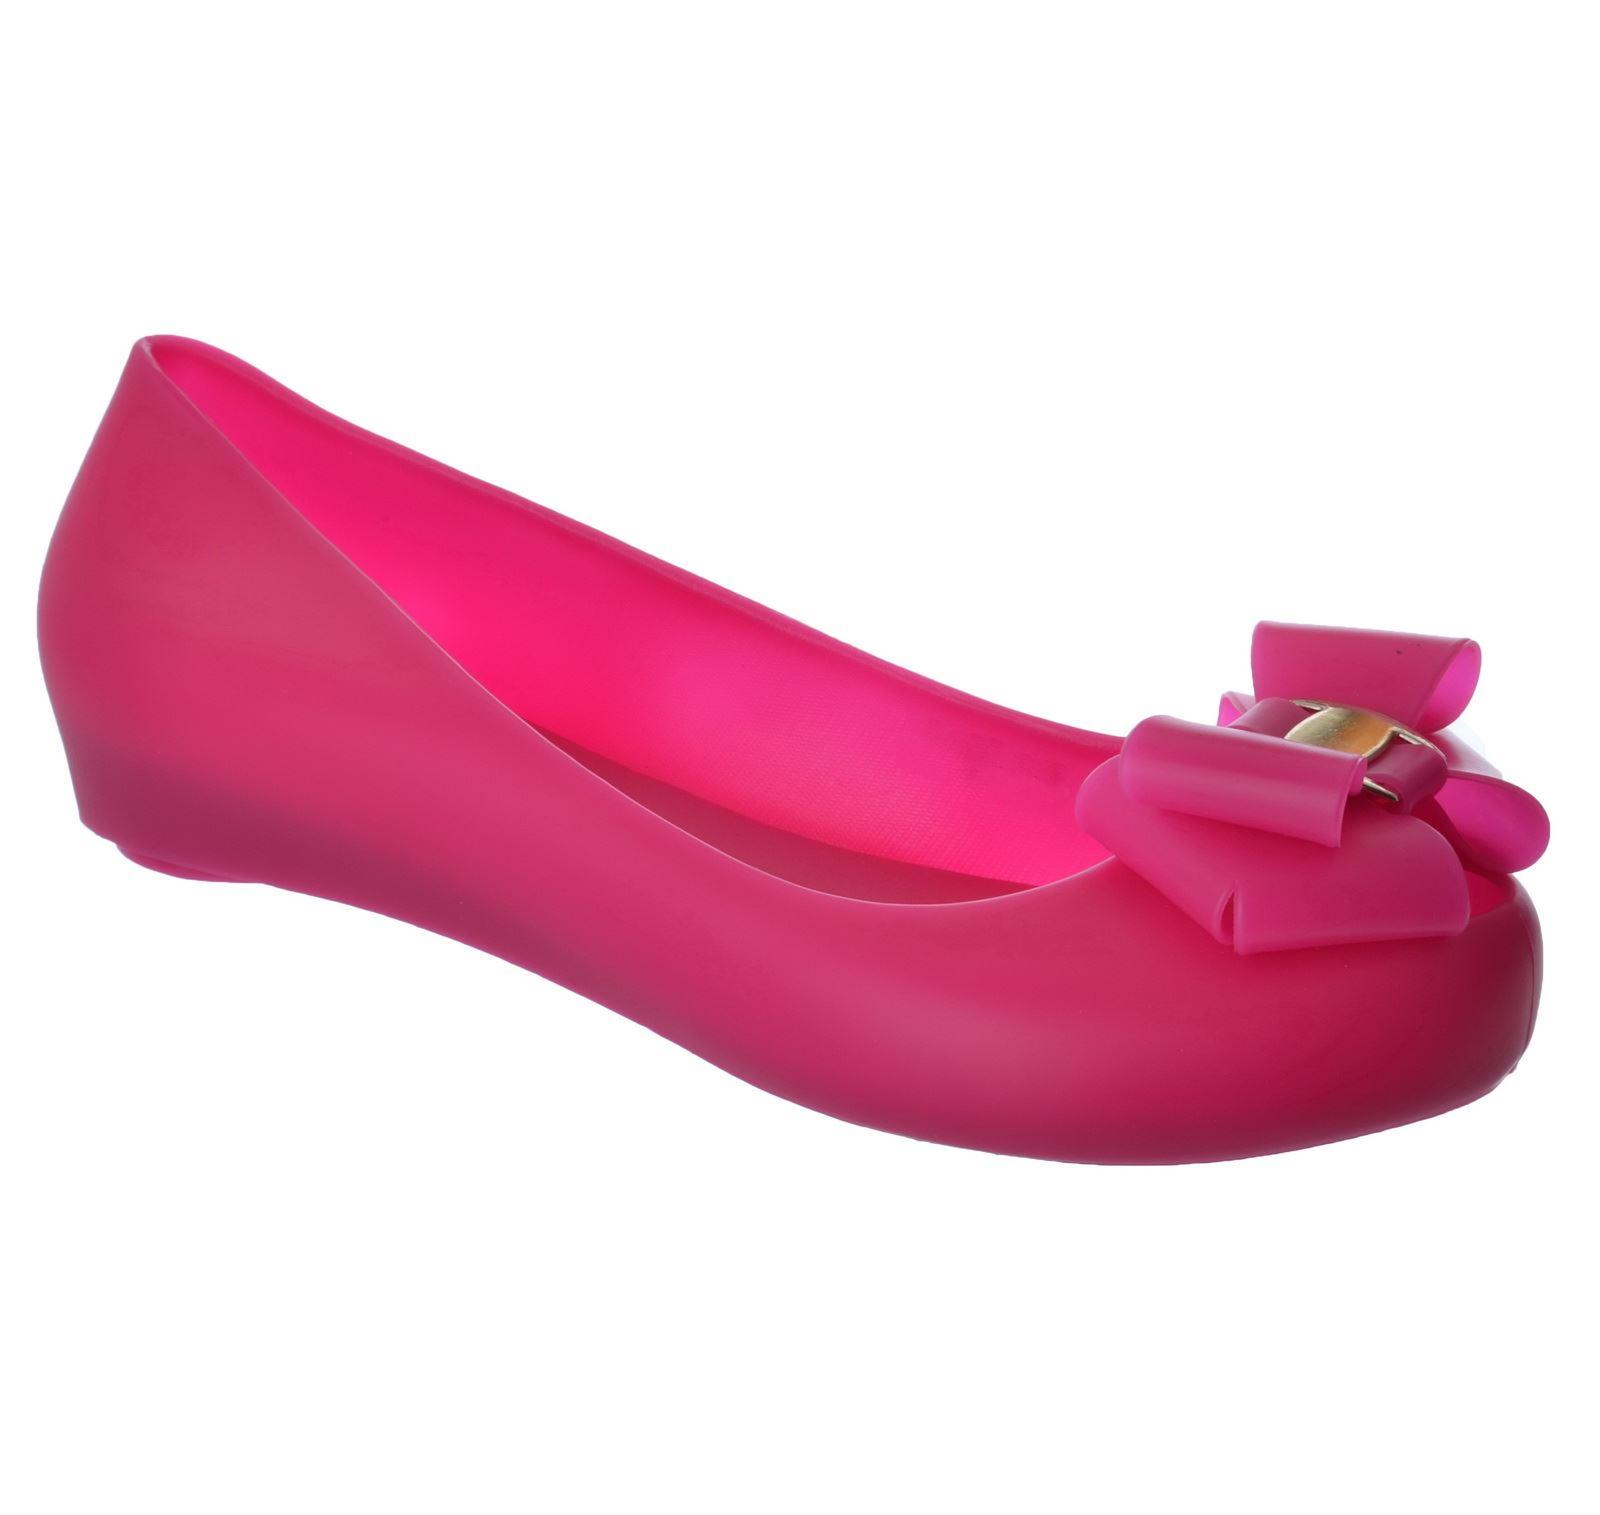 Damas Tacón Bajo Plano Peep Toe Casual Bailarina Mocasines Sandalias Zapatos Talla Jelly